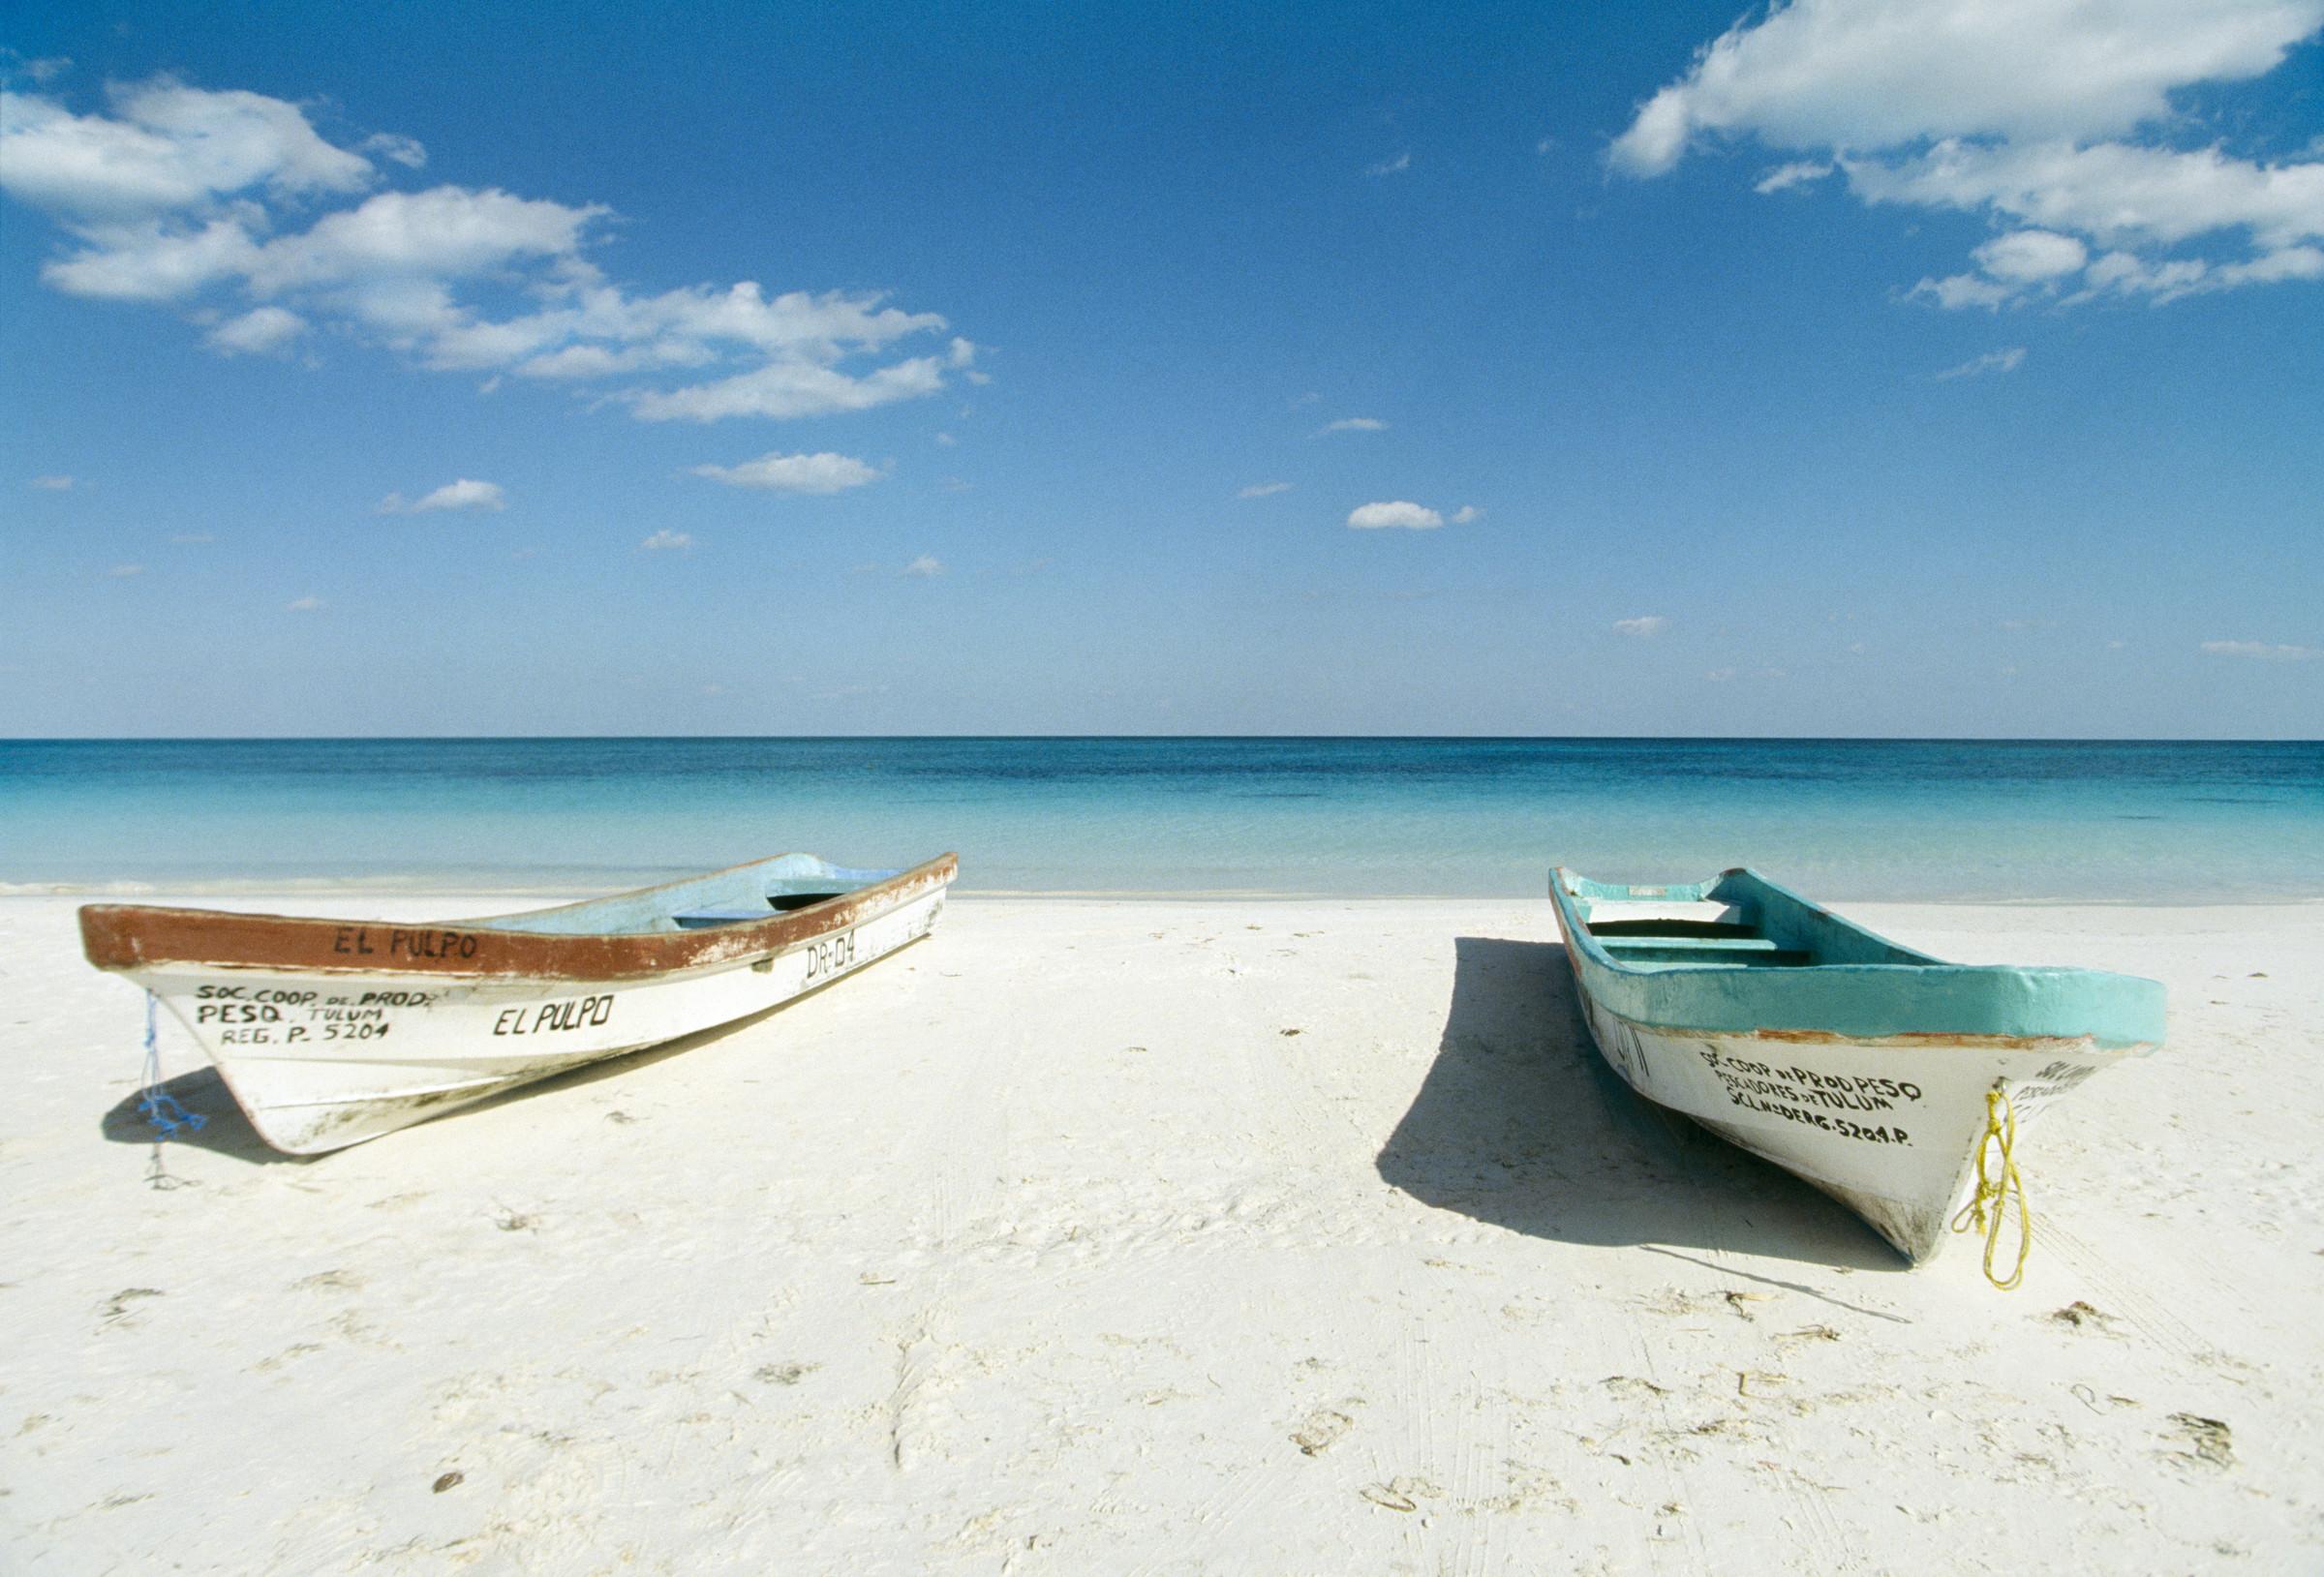 Boats on beach, Tulum, Quintana Roo, Mexico --- Image by © Erik P./zefa/Corbis